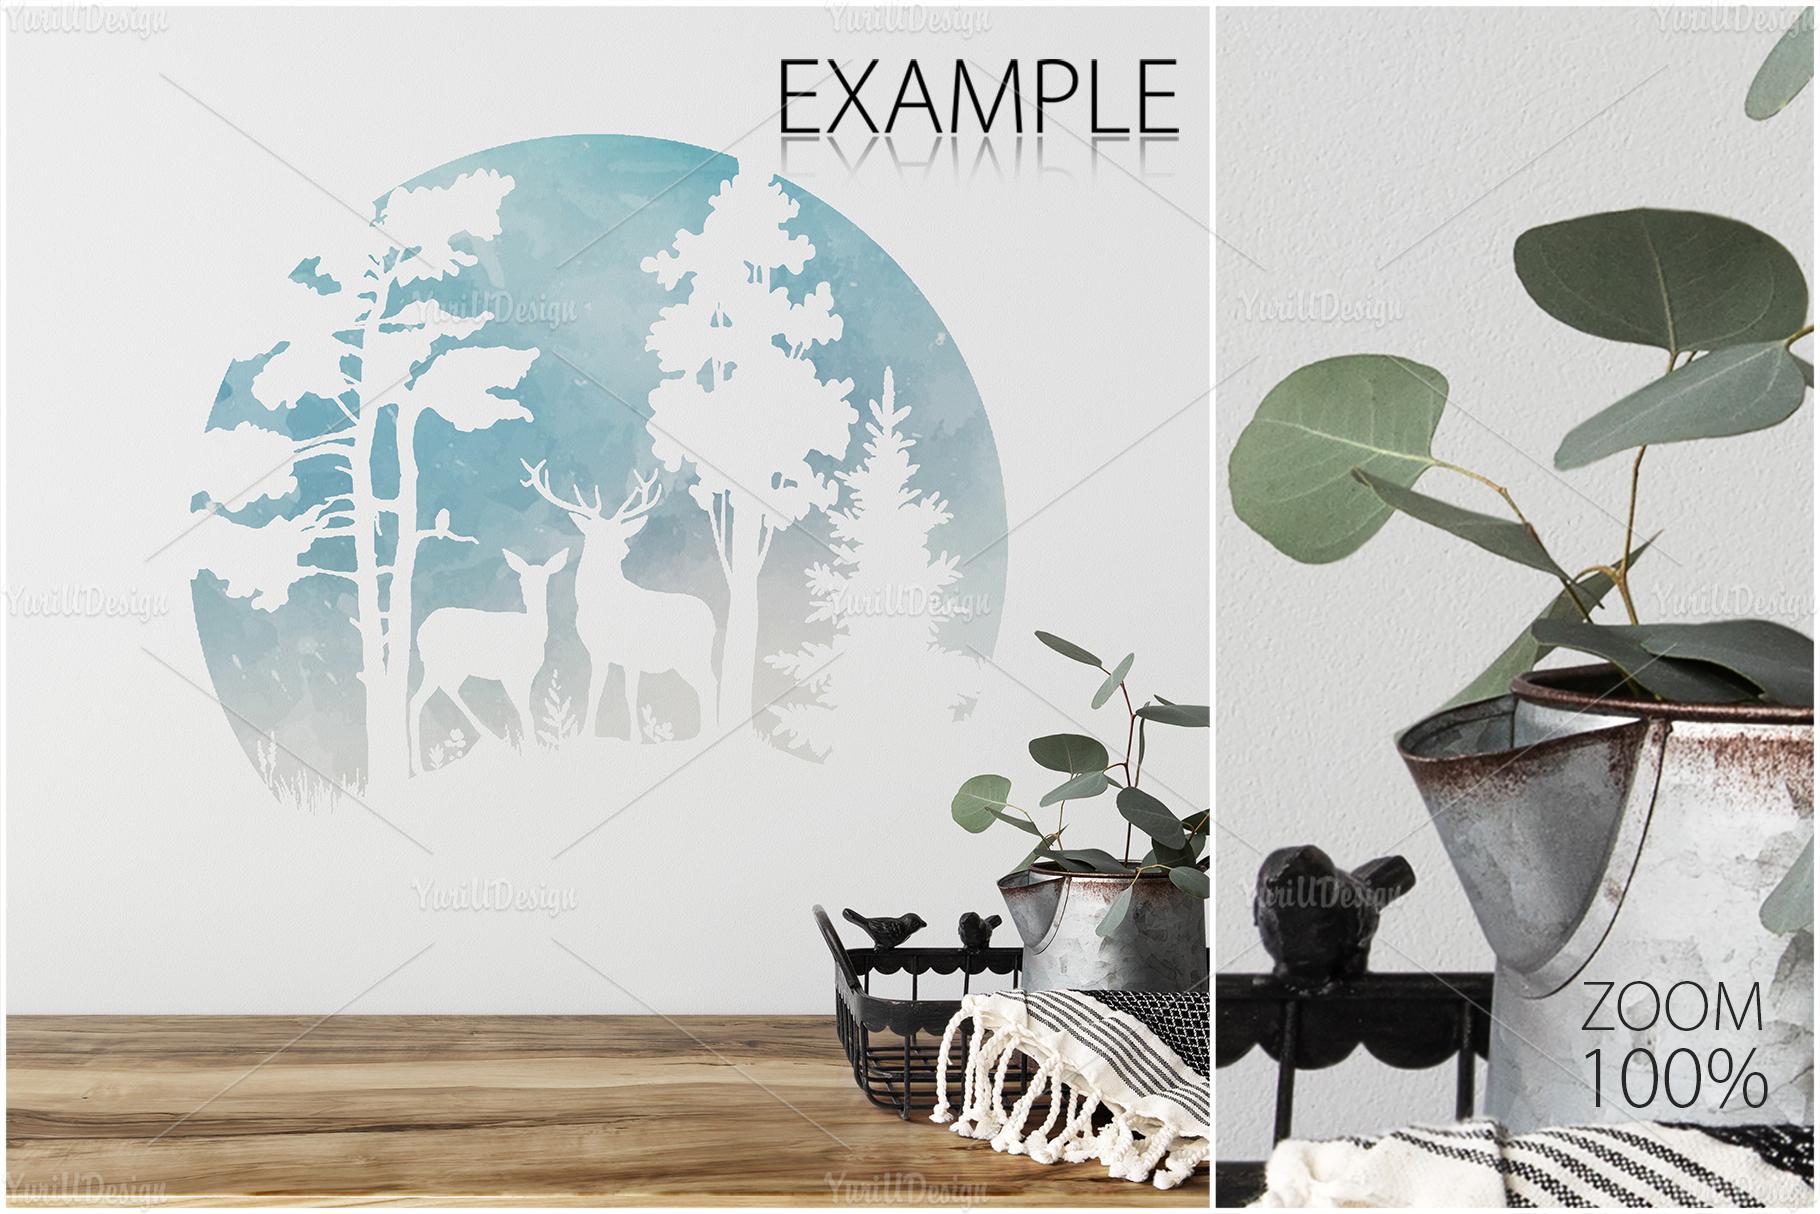 Scandinavian Interior Frames & Walls Mockup Bundle - 3 example image 26